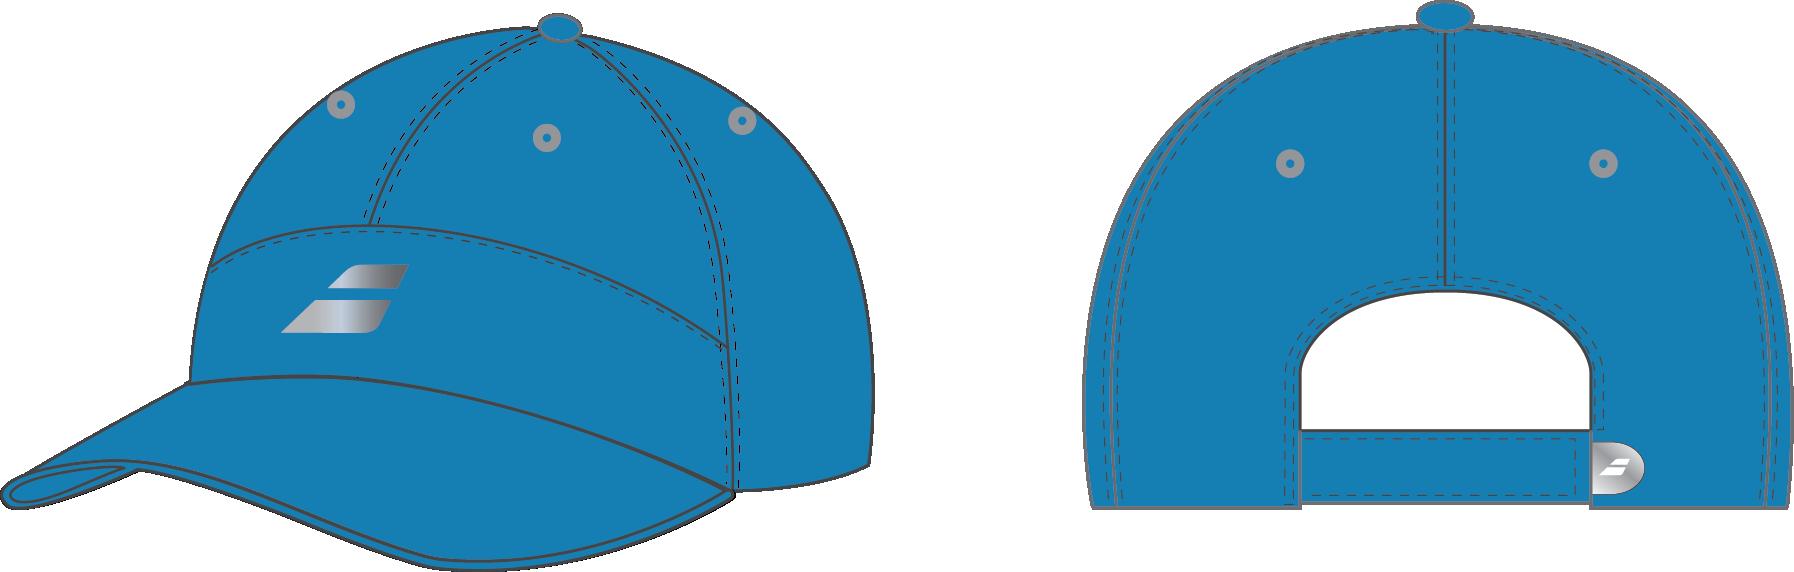 Babolat Cap Microfiber Blue 2017